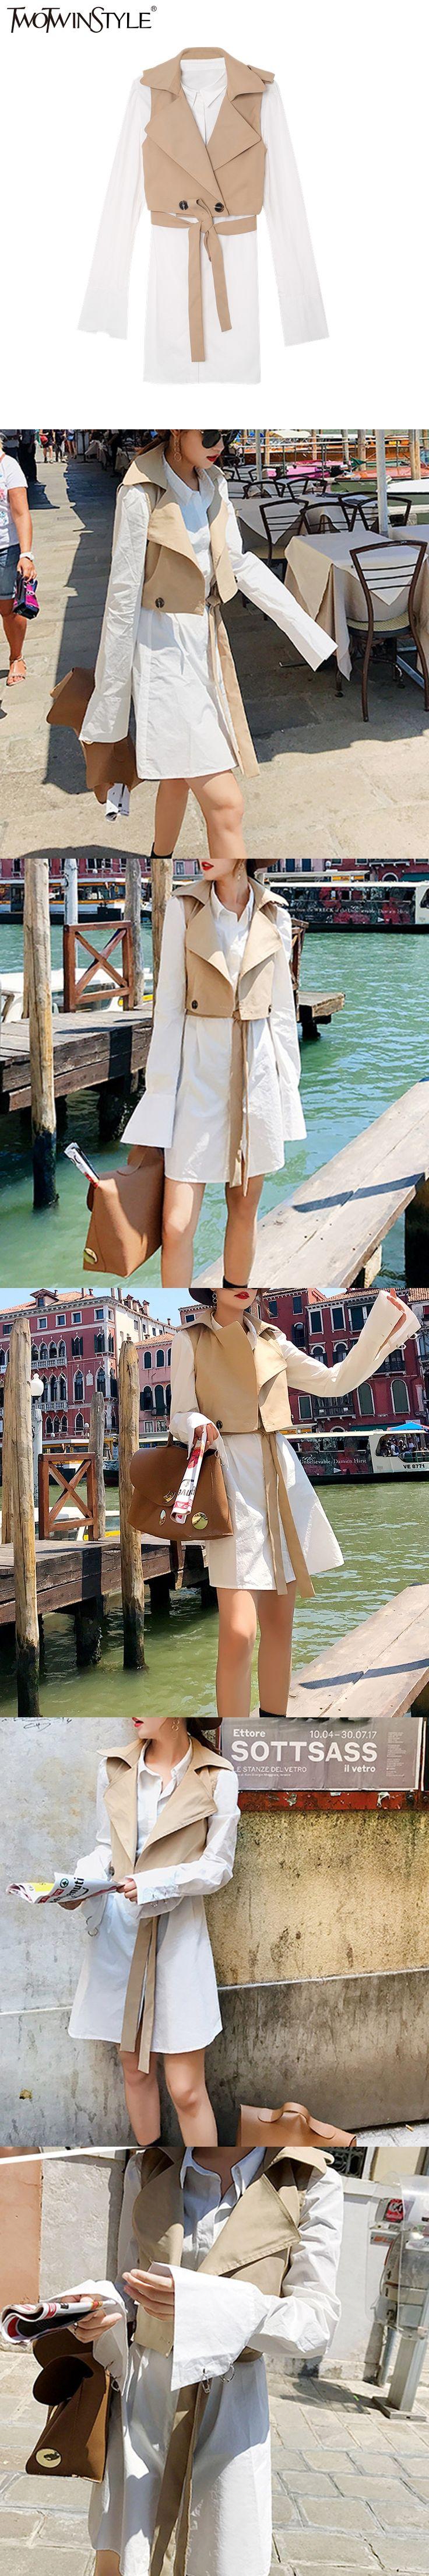 TWOTWINSTYLE 2017 Lace Up Autumn Costumes for Women Two Piece Set Short Vest Female Mini Dress Shirt Woman Suit Casual Clothes